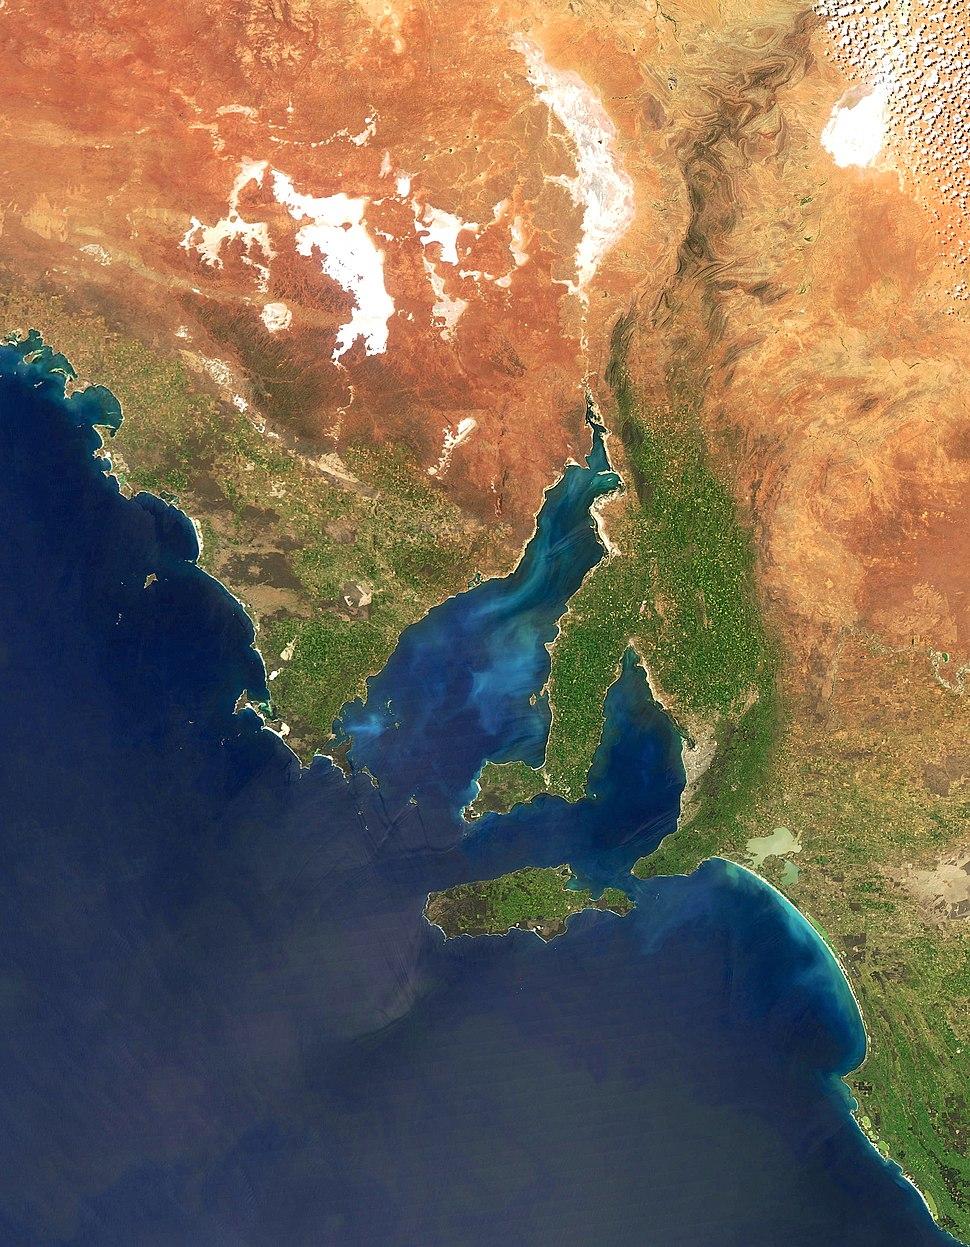 Australia.A2010283.0435.250m